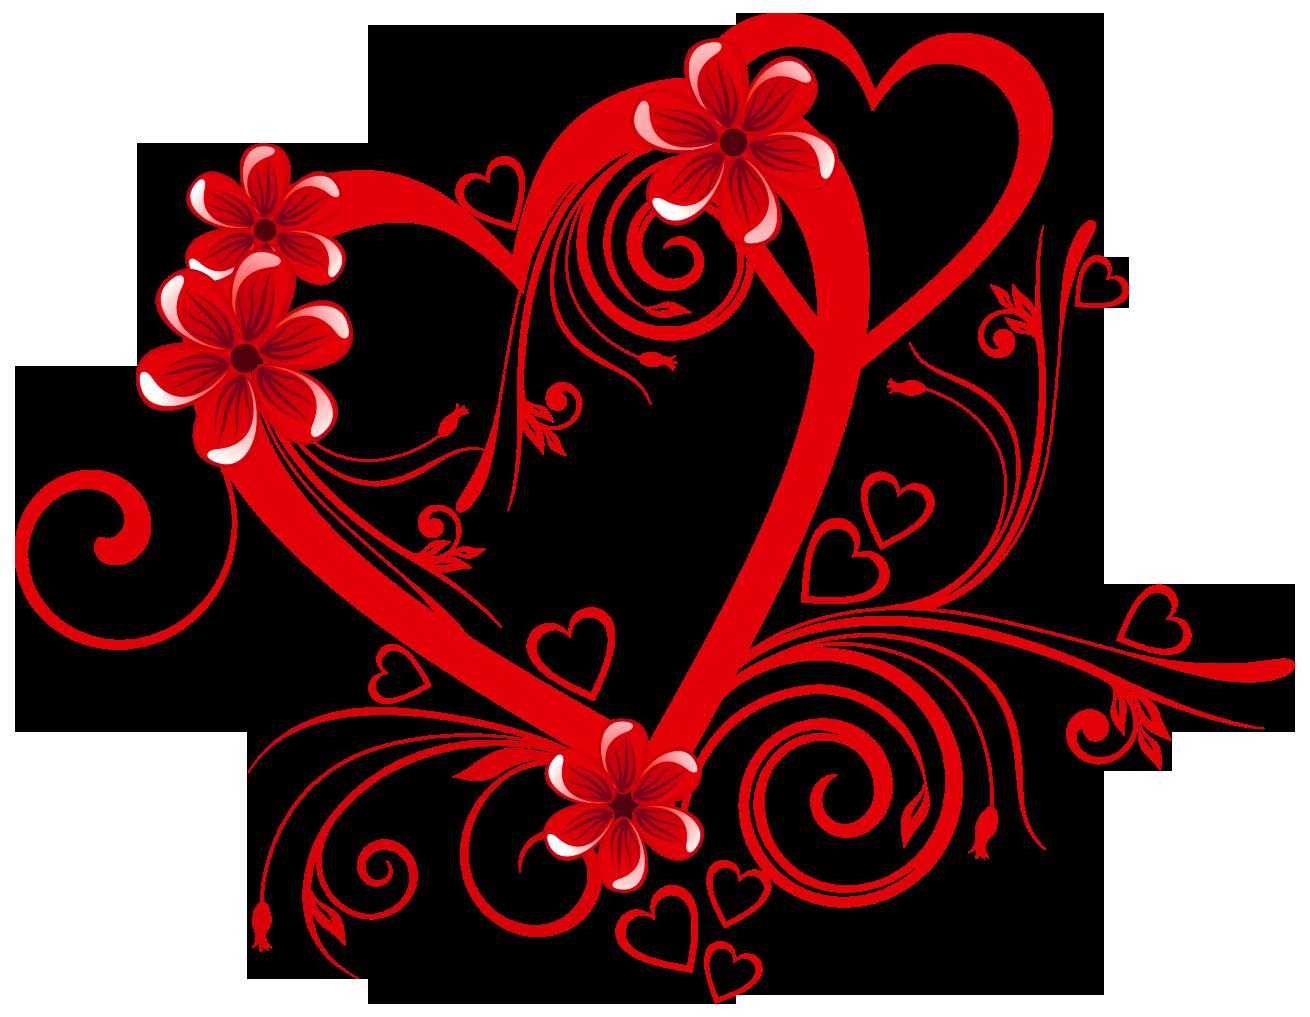 Book thief clipart jpg free download I Love U Images Free Download - ClipArt Best | GINGERS HEART ... jpg free download